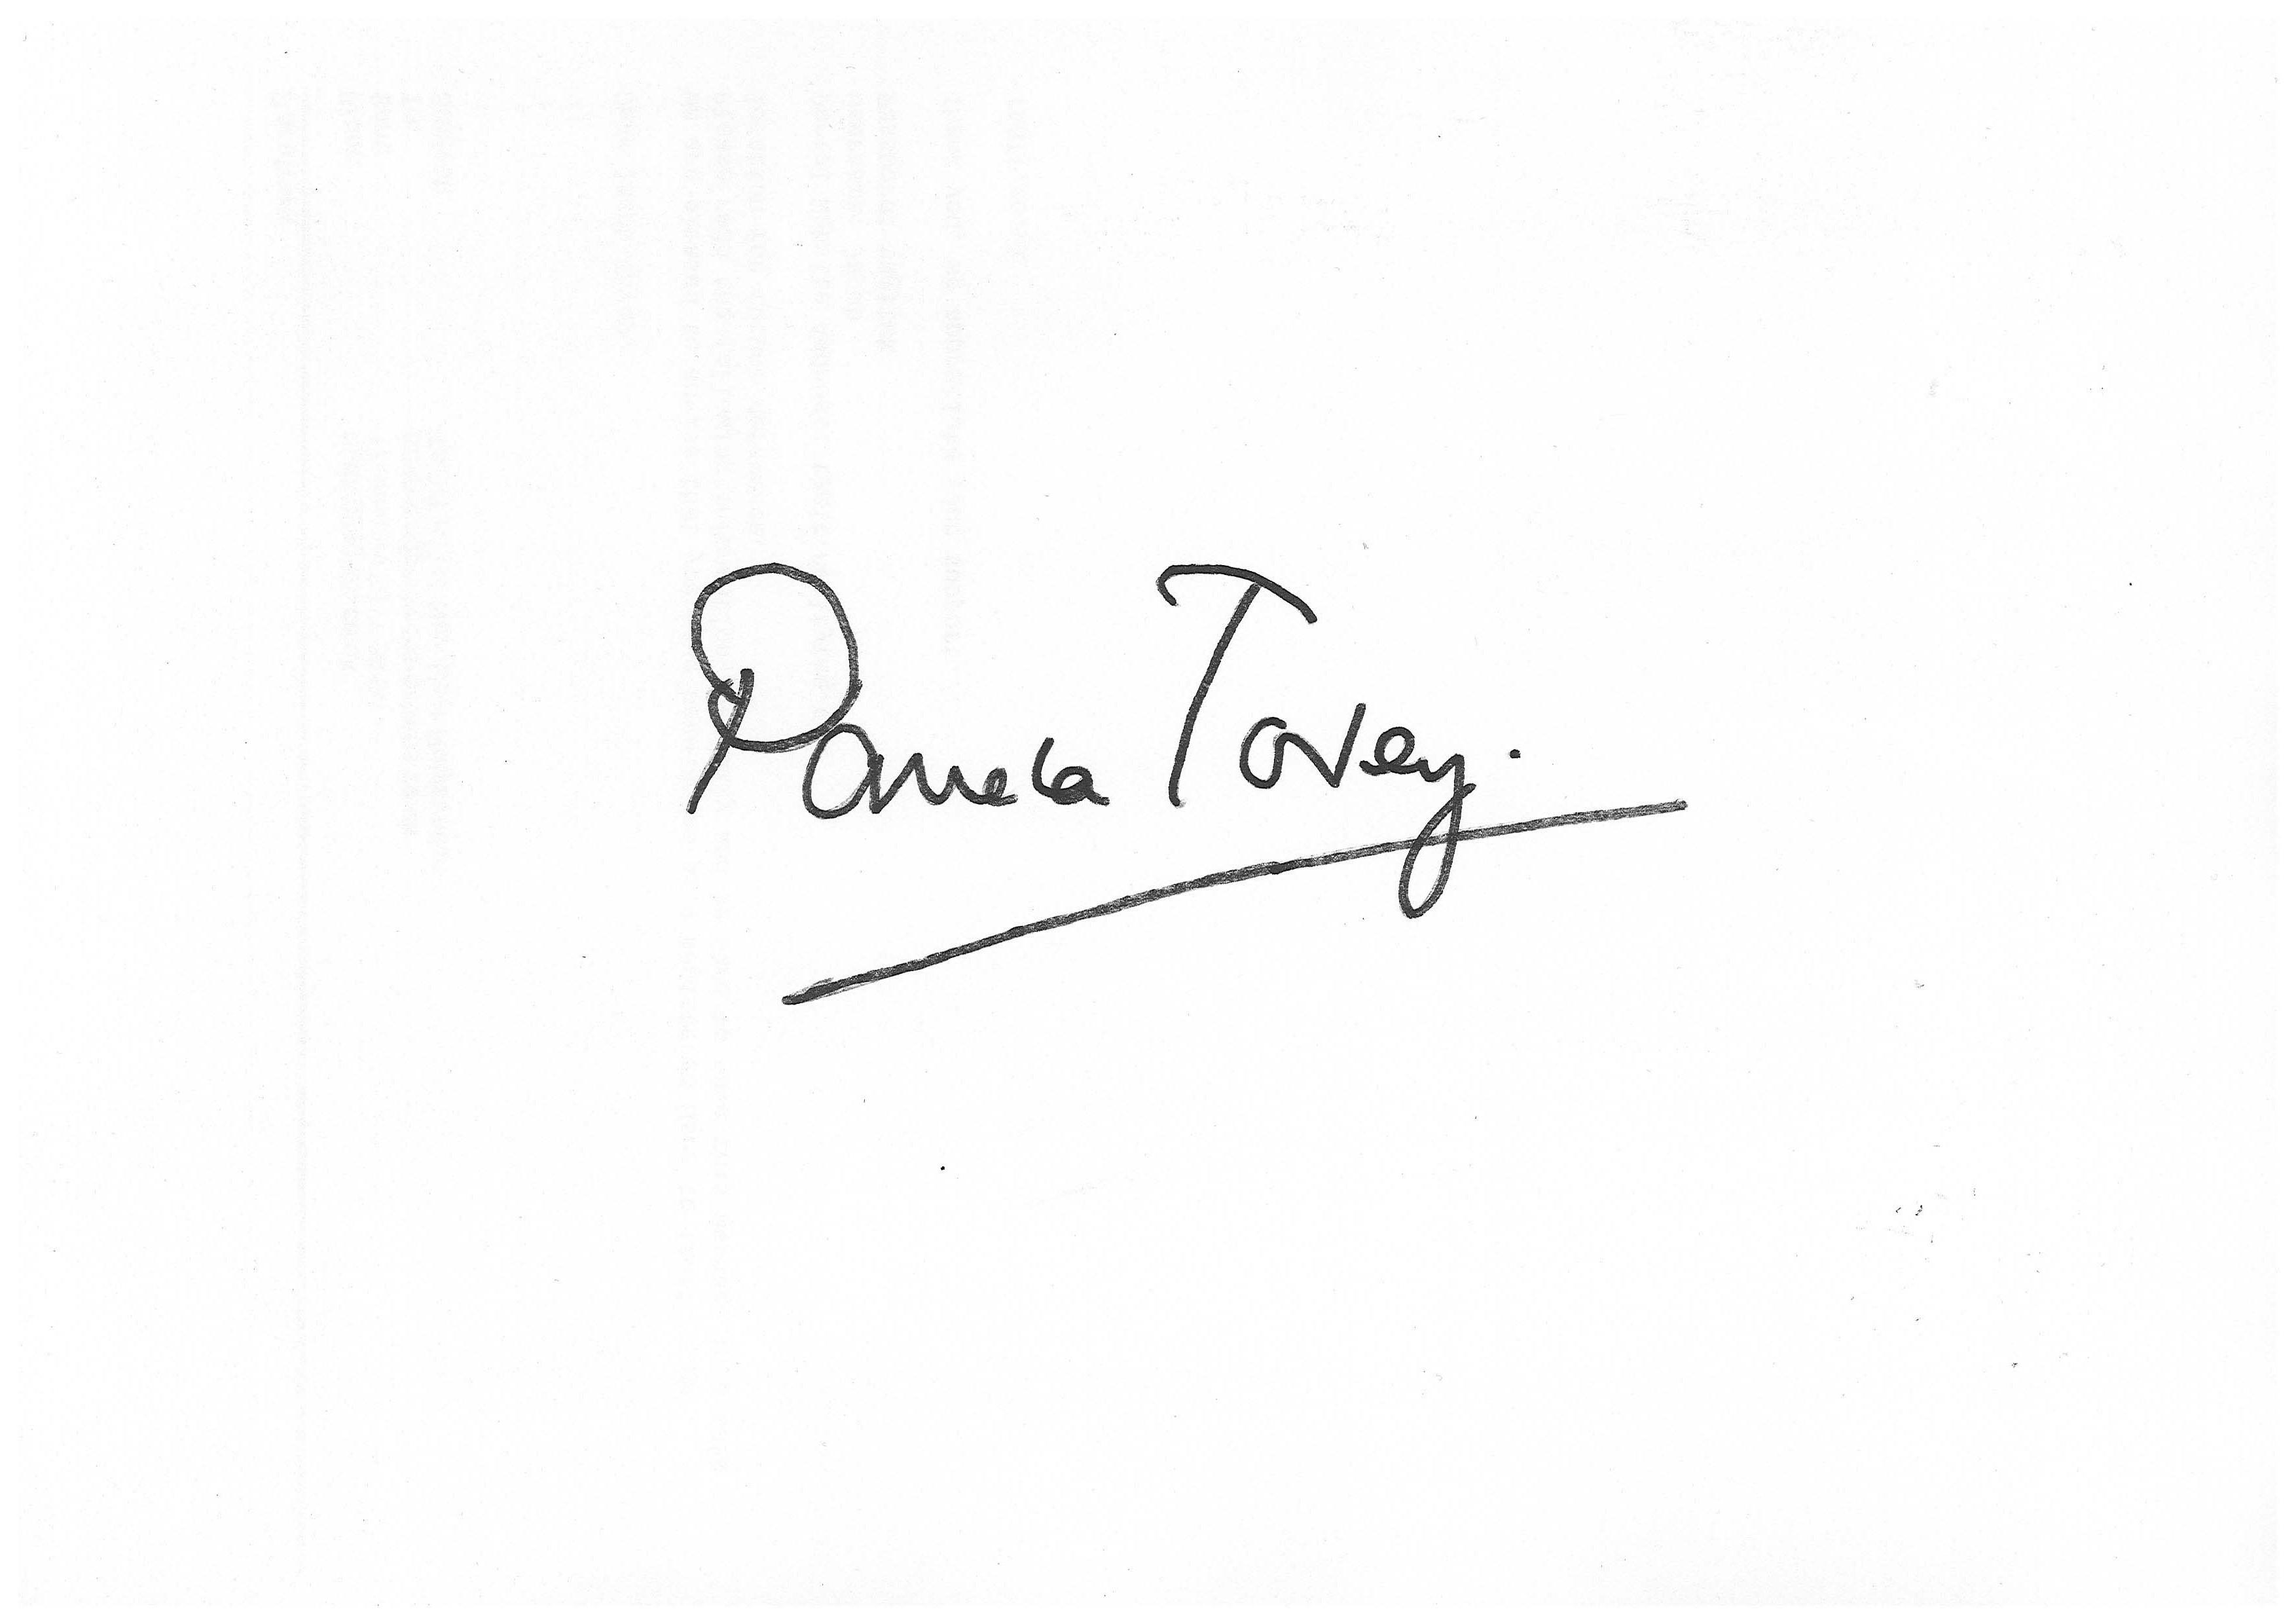 Paul Tovey